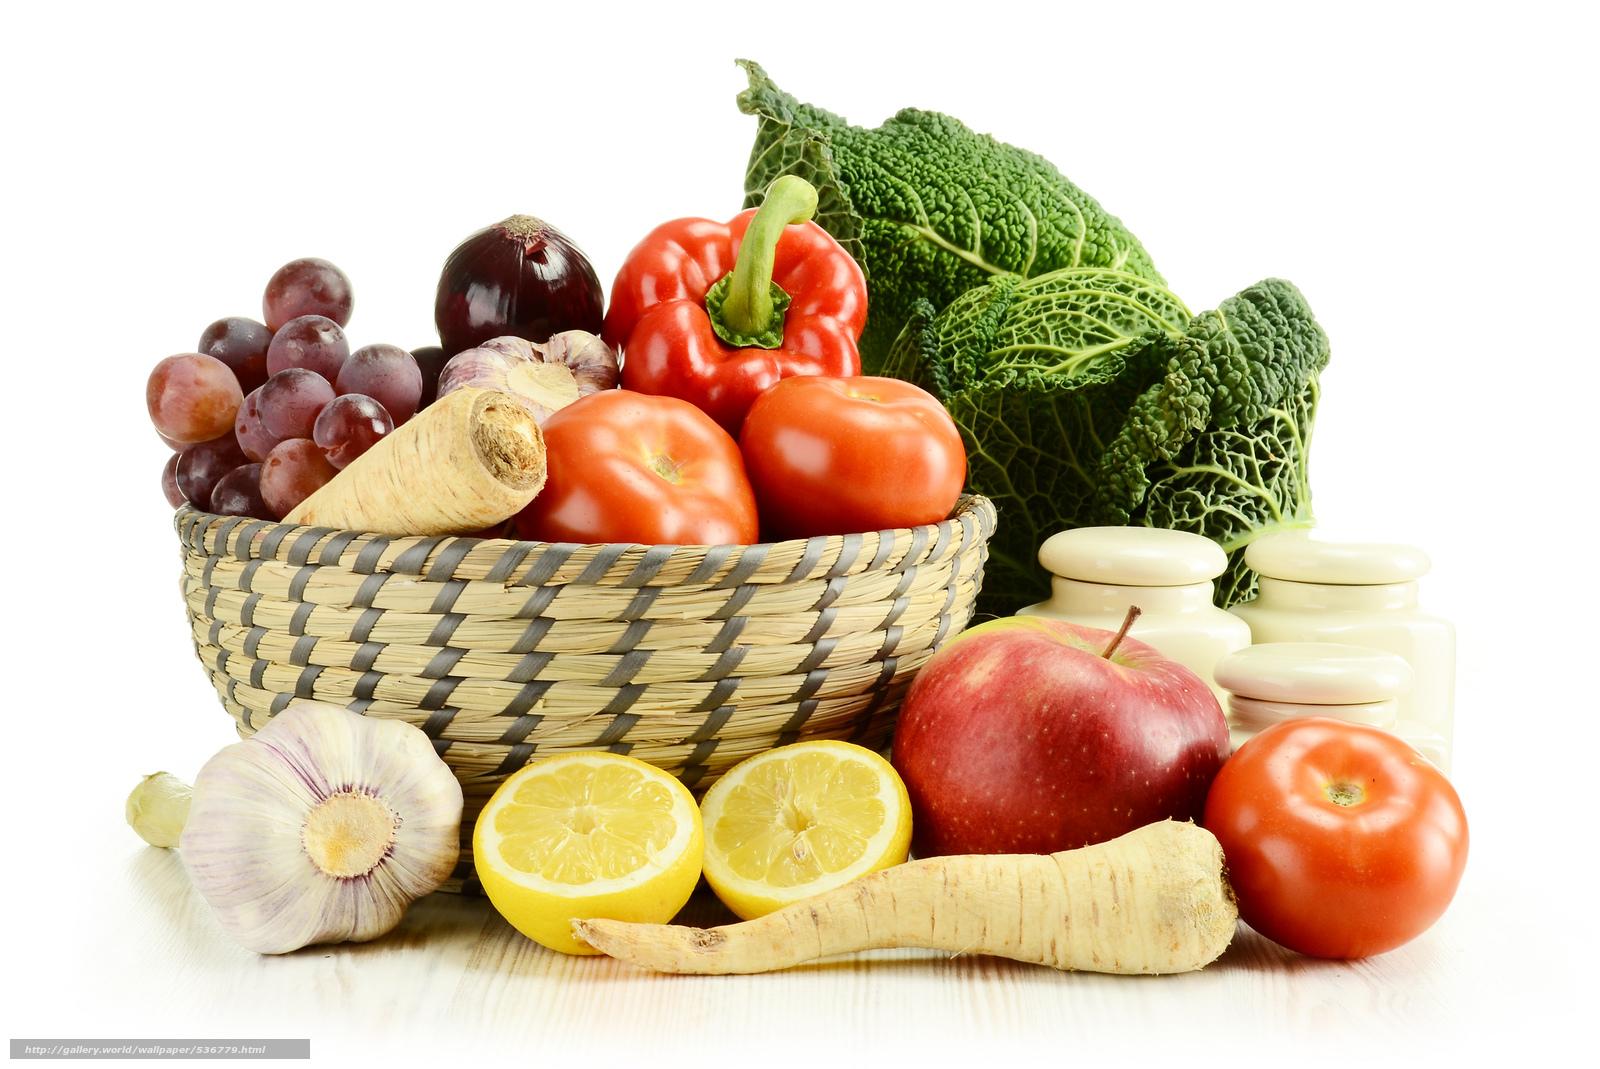 Download wallpaper harvest,  fruit,  vegetables free desktop wallpaper in the resolution 9048x6048 — picture №536779